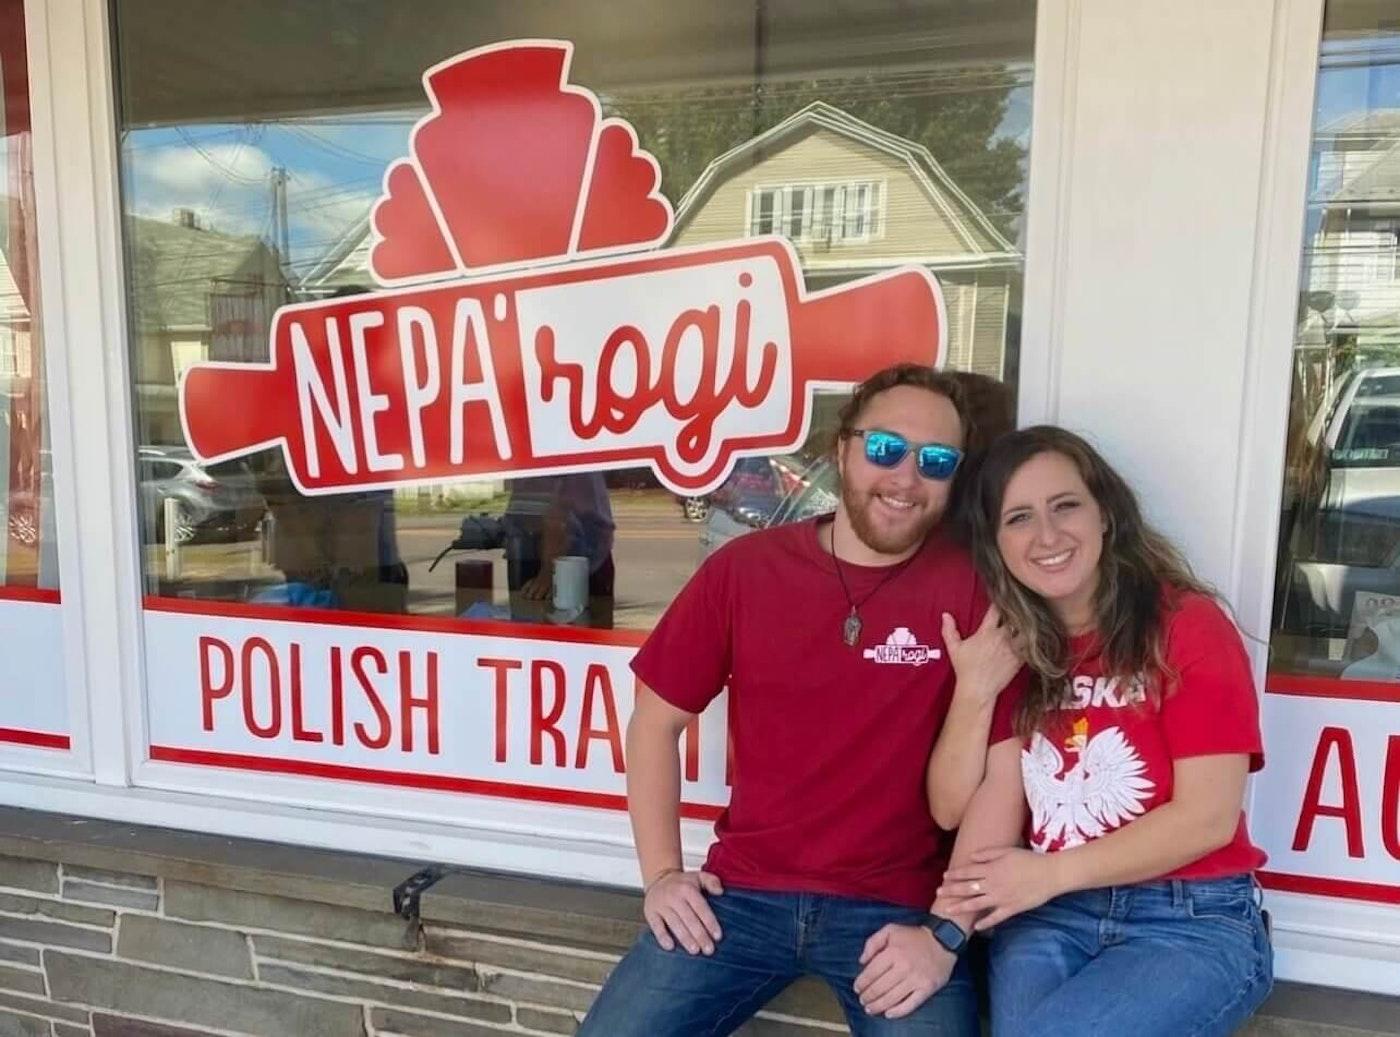 NEPA'rogi owners Frank Marcinkowski and Lauren Gorney, in front of their Luzerne County shop. (Courtesy of Lauren Gorney)